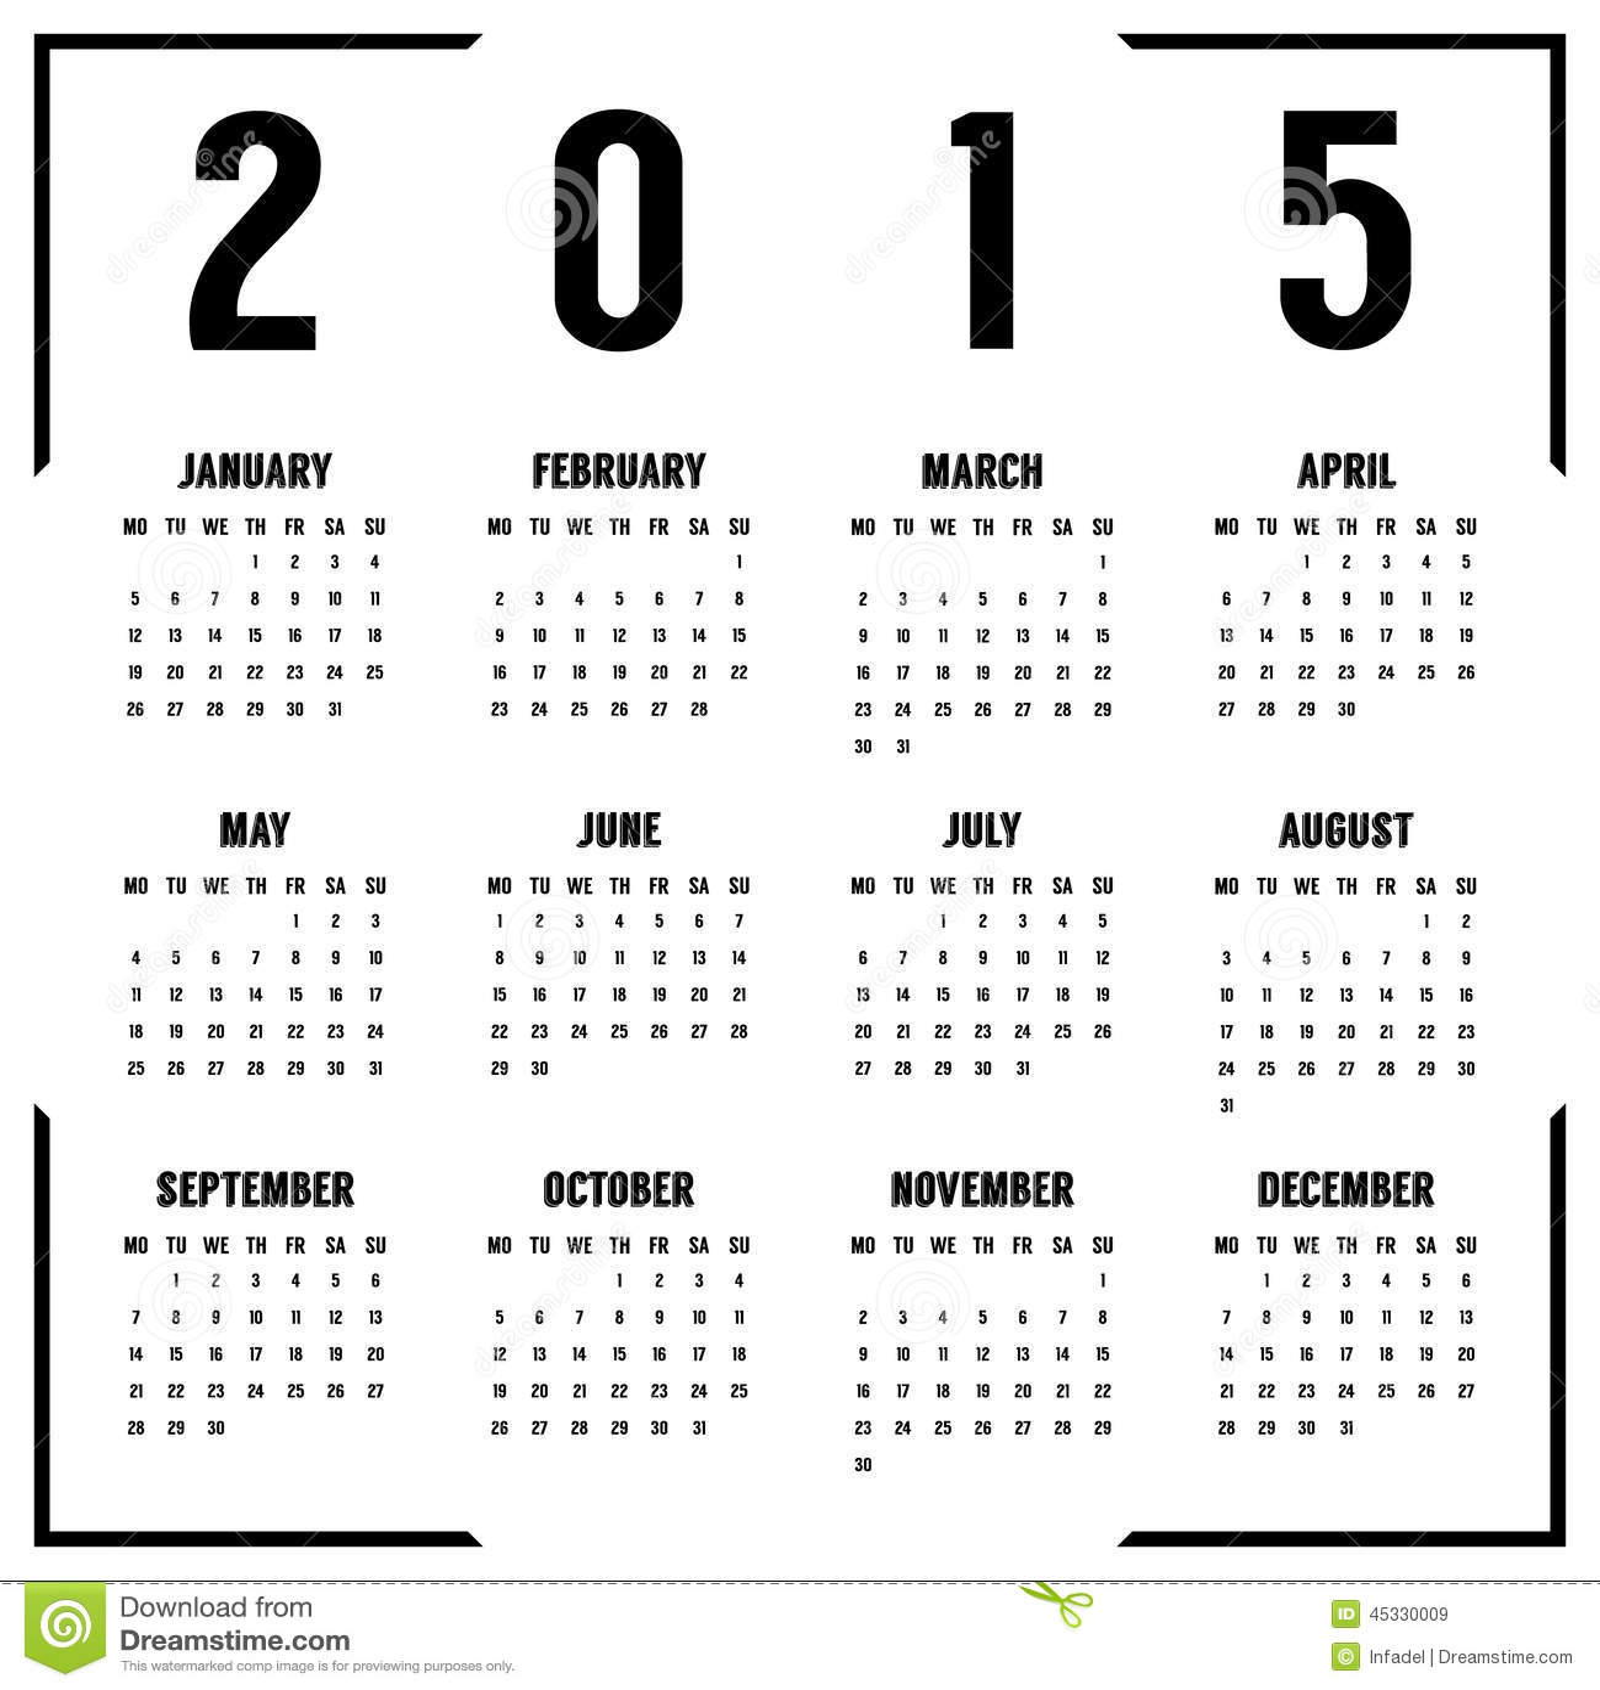 Calendar Black And White : European black and white year calendar stock vector